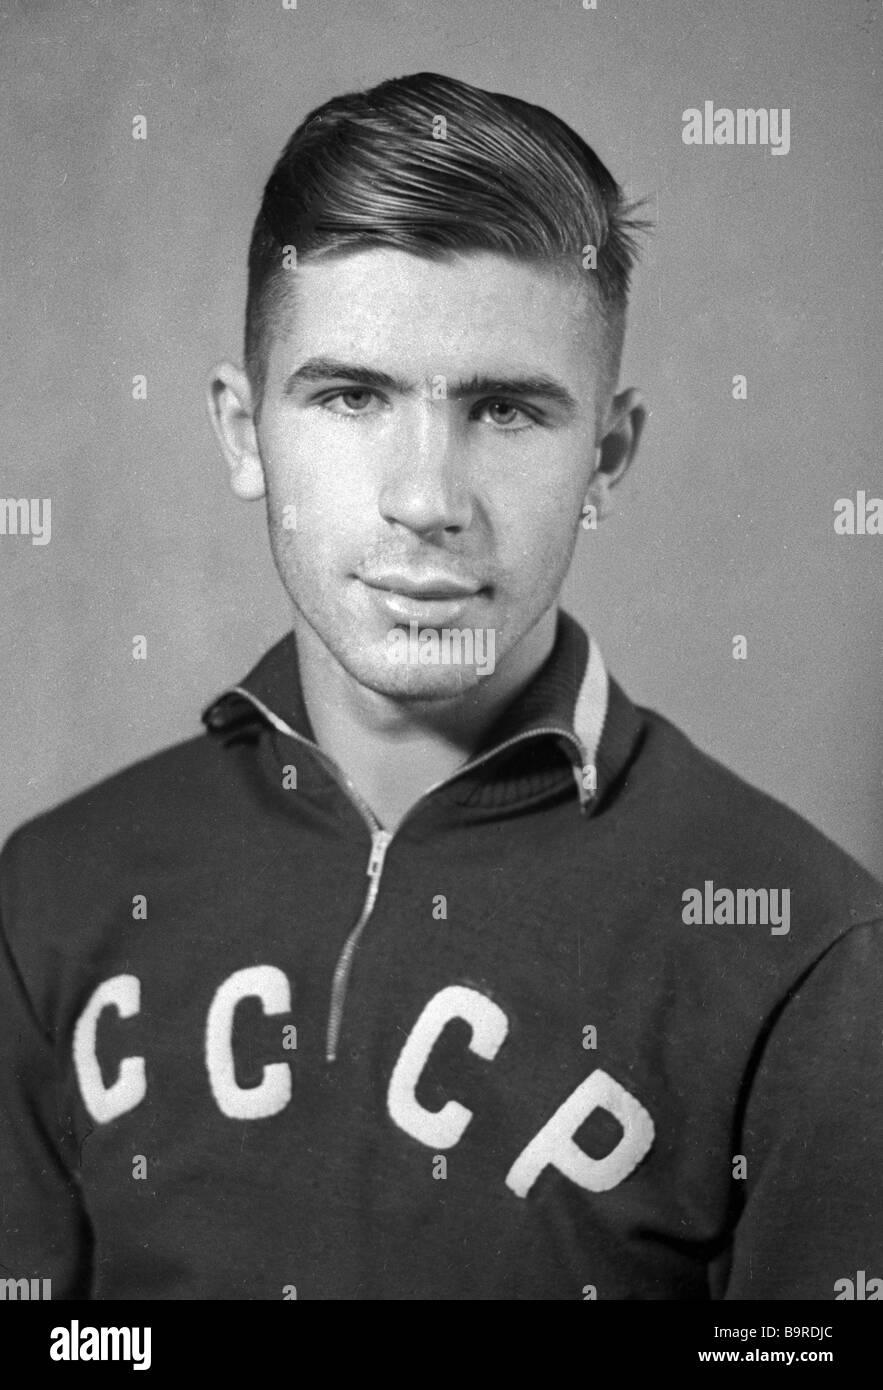 Olympic rowing champion Vyacheslav Ivanov - Stock Image